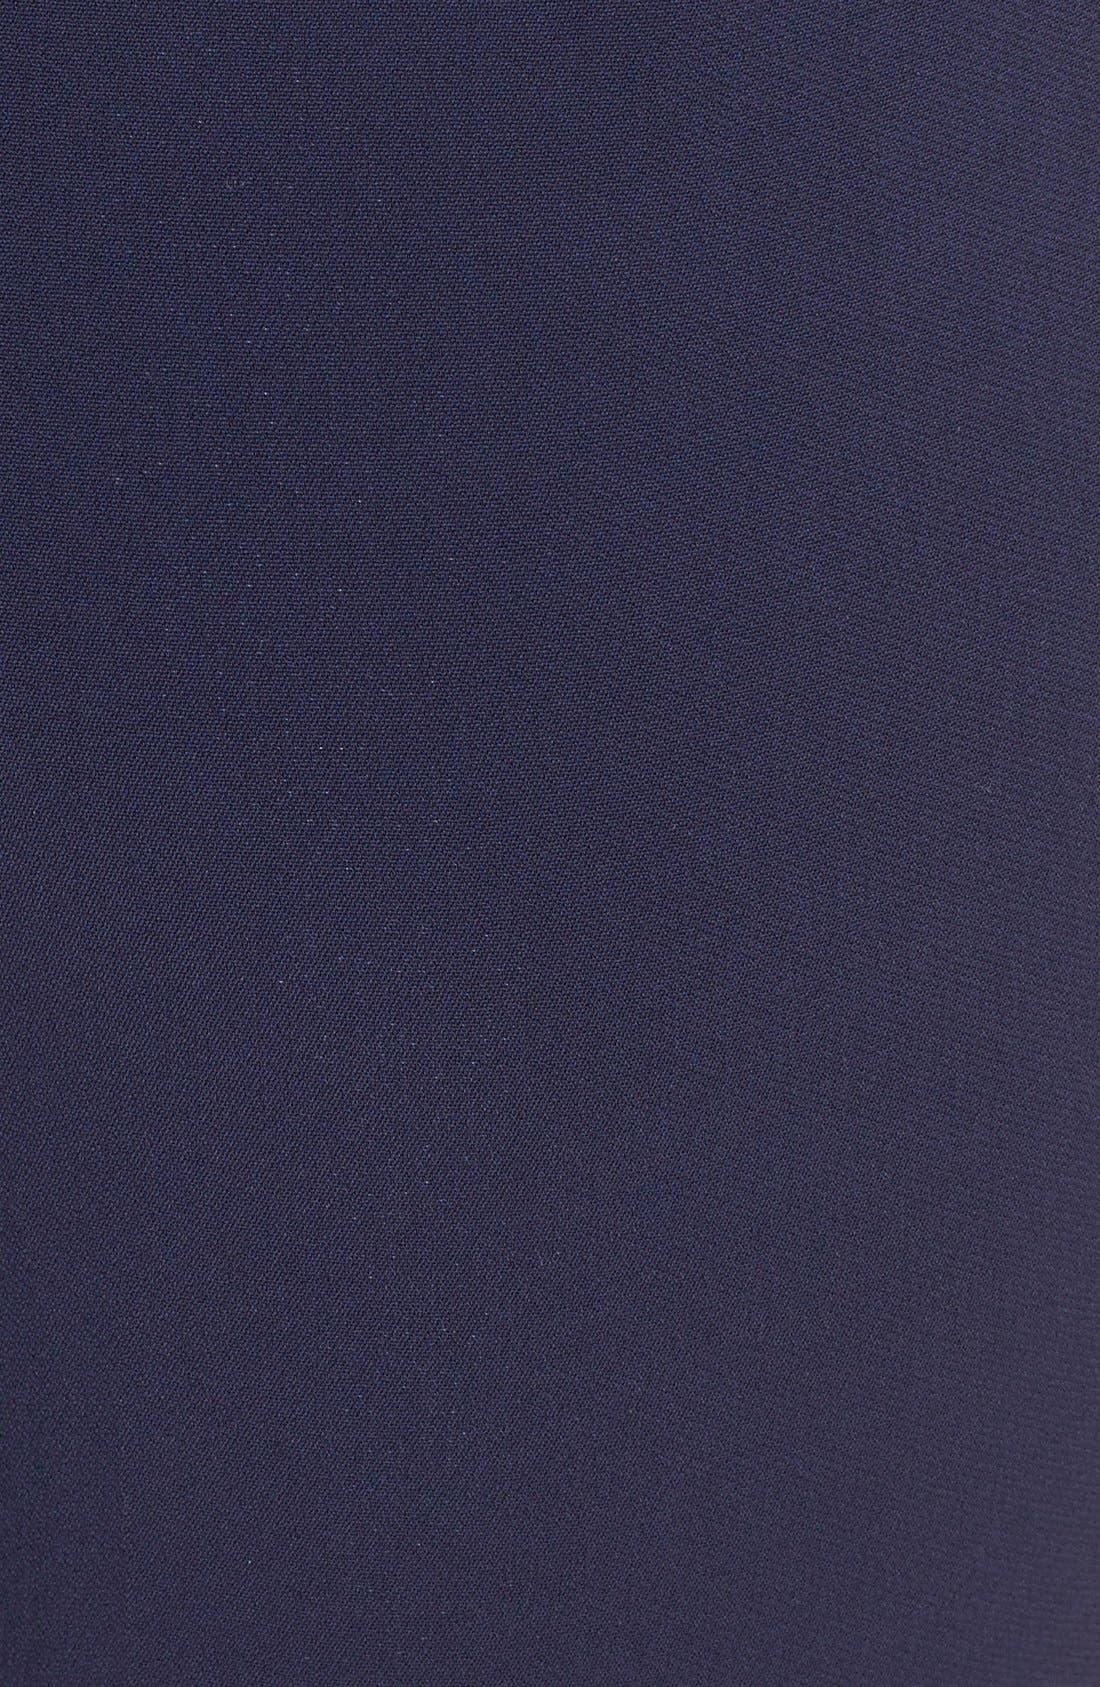 Alternate Image 3  - Nordstrom Signature and CarolineIssa'Pearl' Skinny Pants